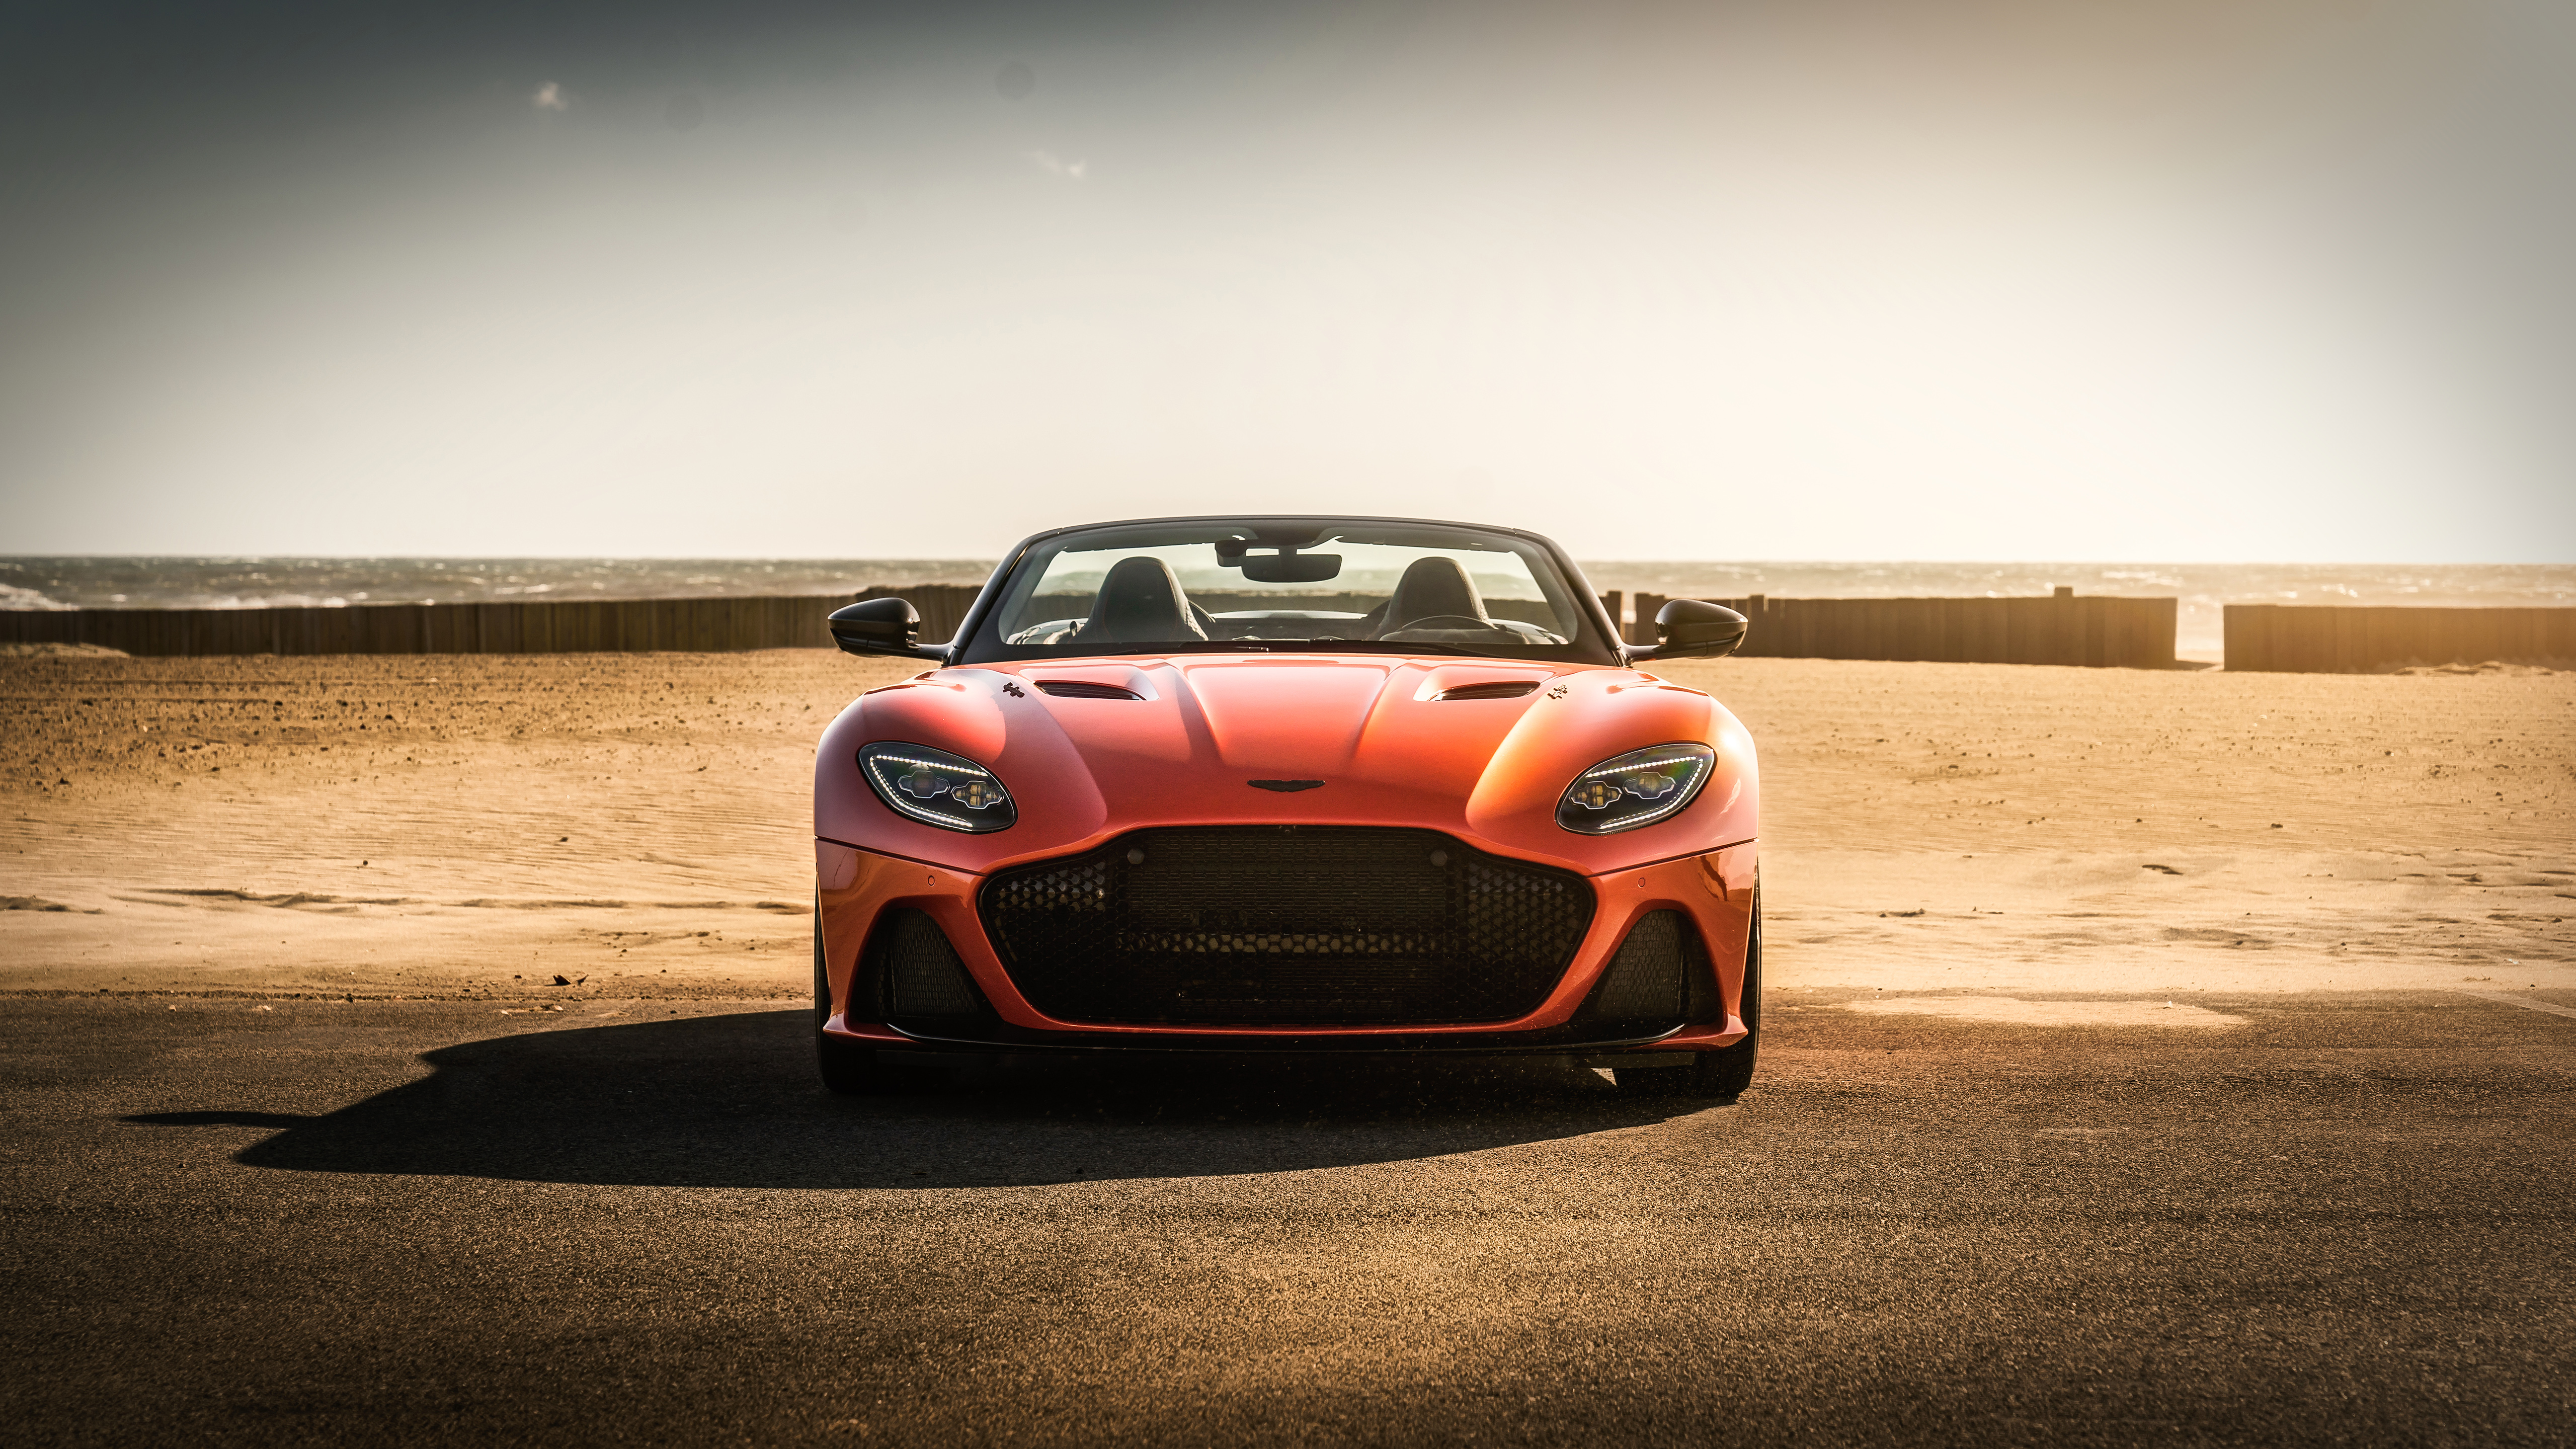 Aston Martin Dbs Superleggera Volante 2019 5k 2 Wallpaper Hd Car Wallpapers Id 12740